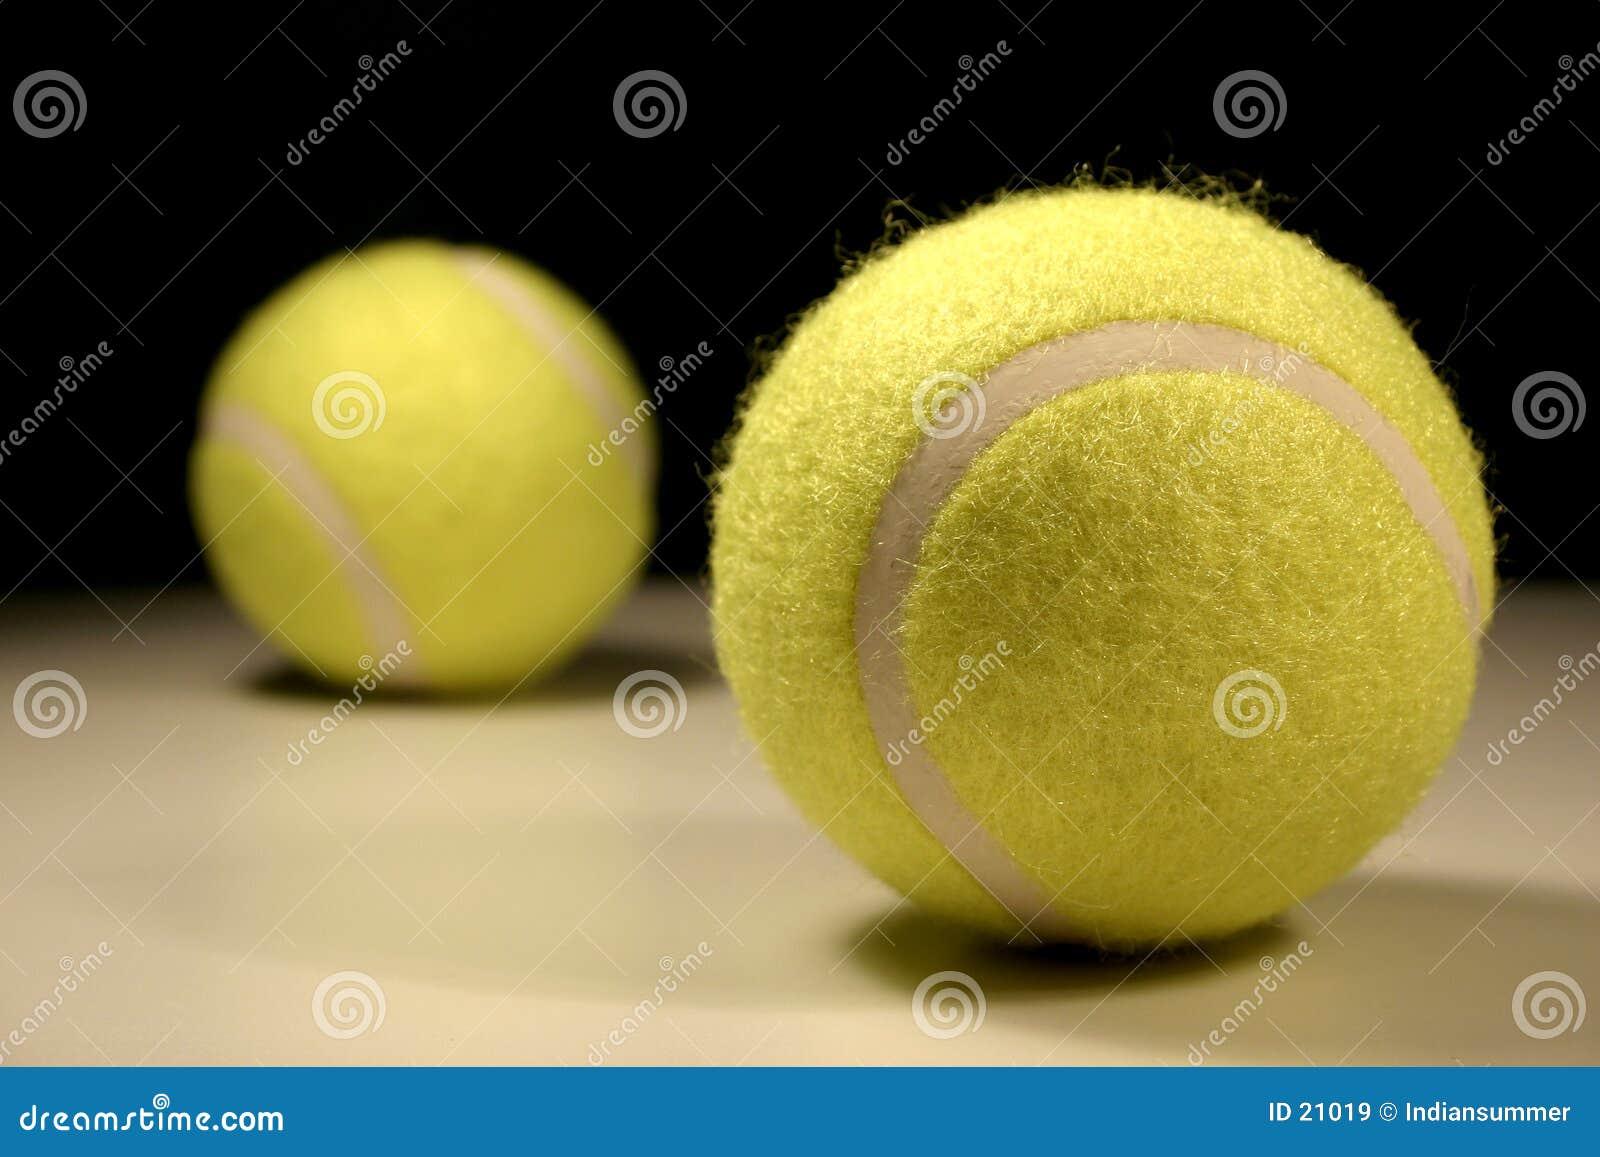 Tenis-bolas III